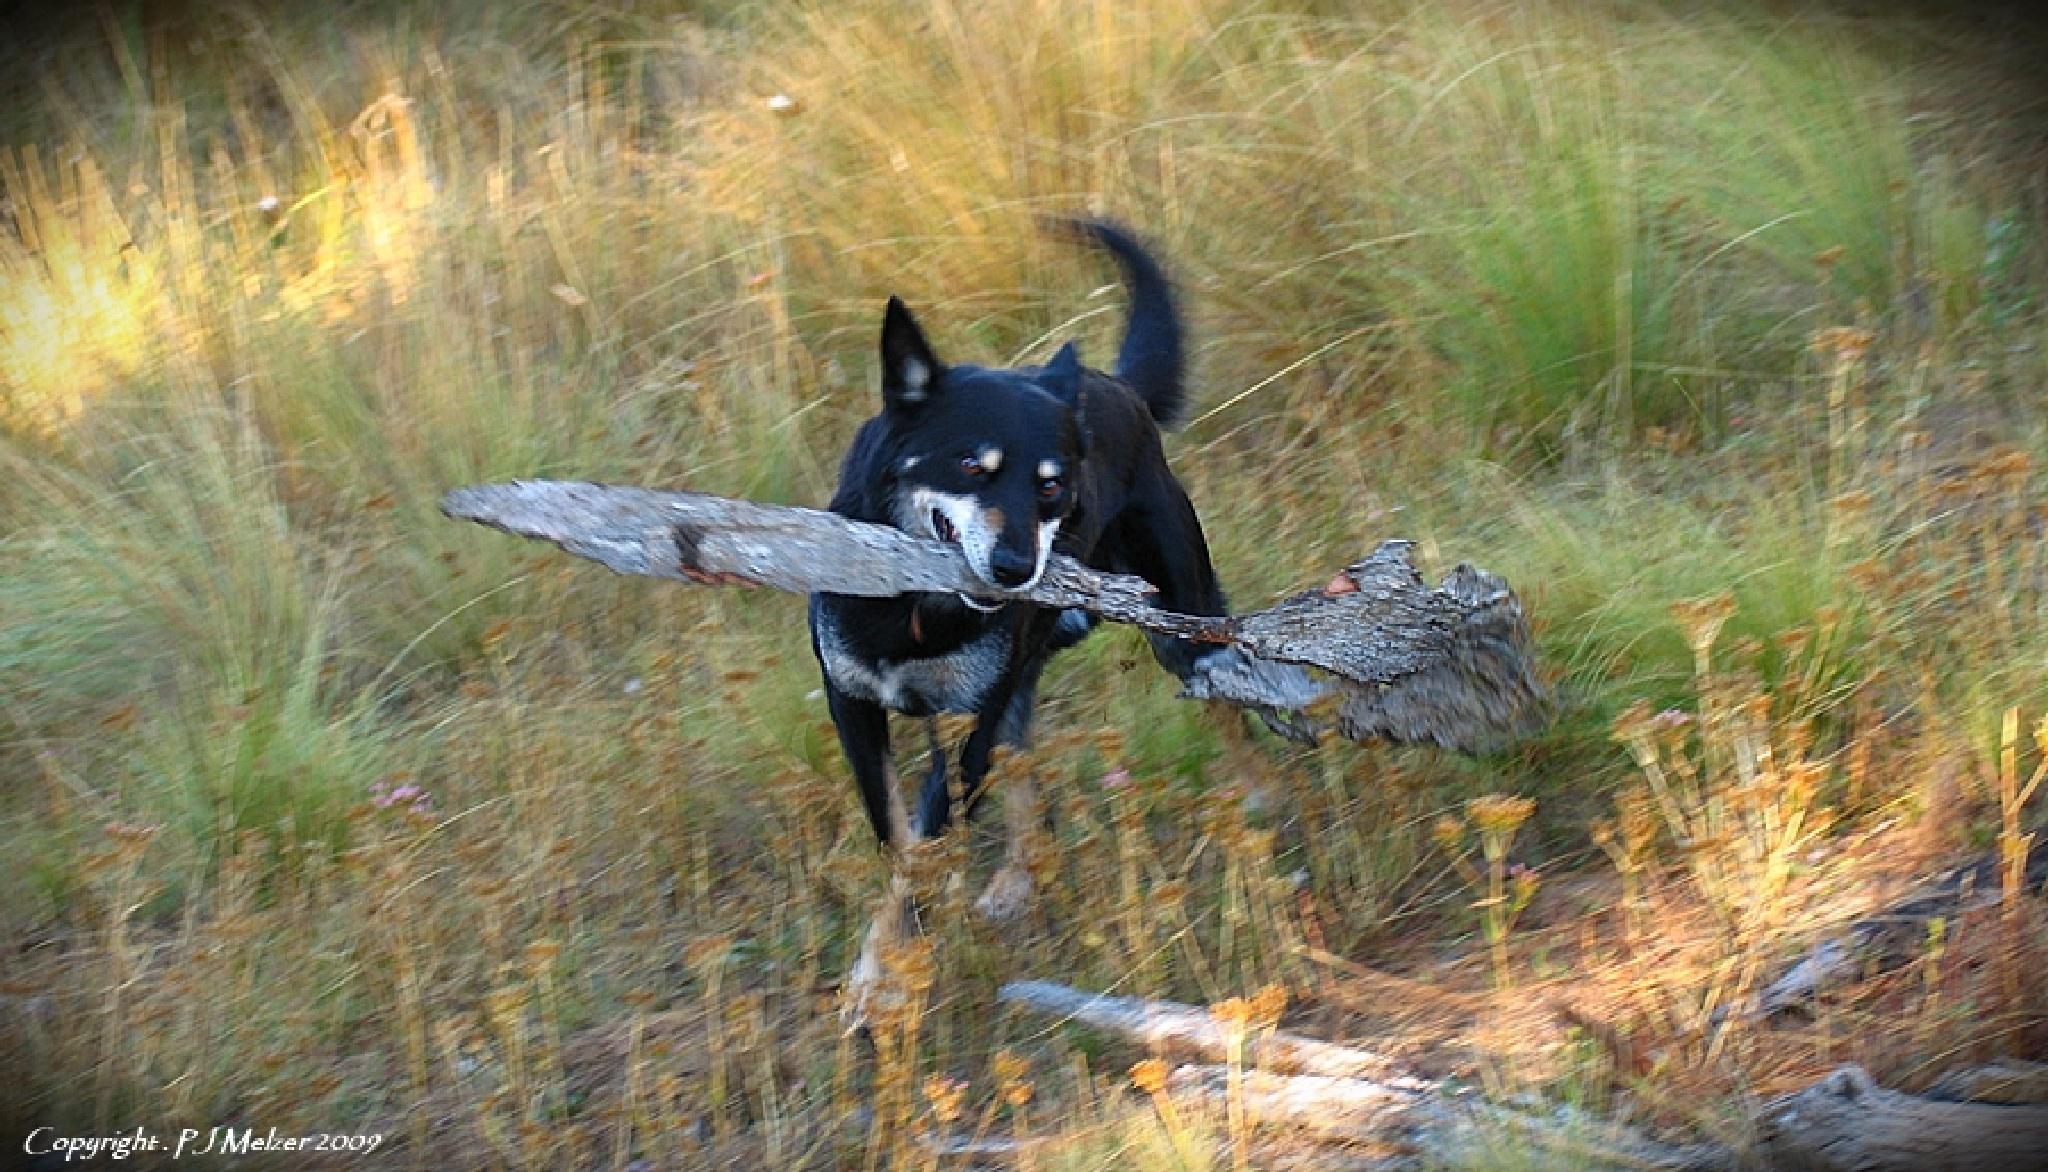 Max Likes Sticks by Maxiboy571